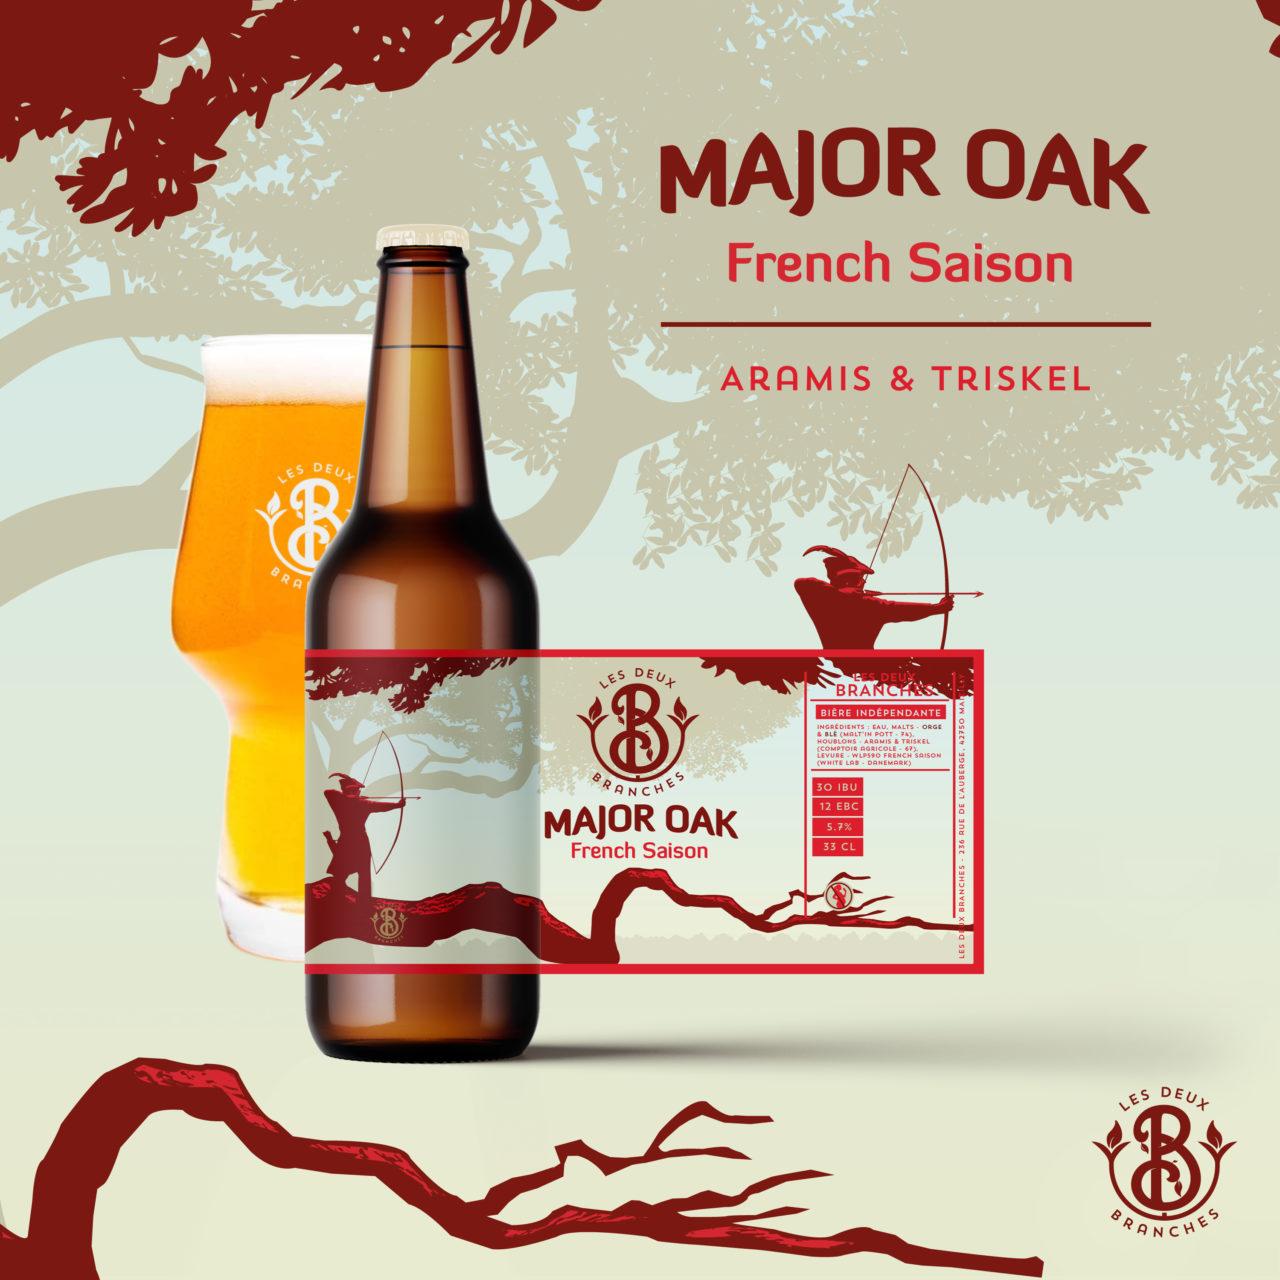 bière blonde major oak